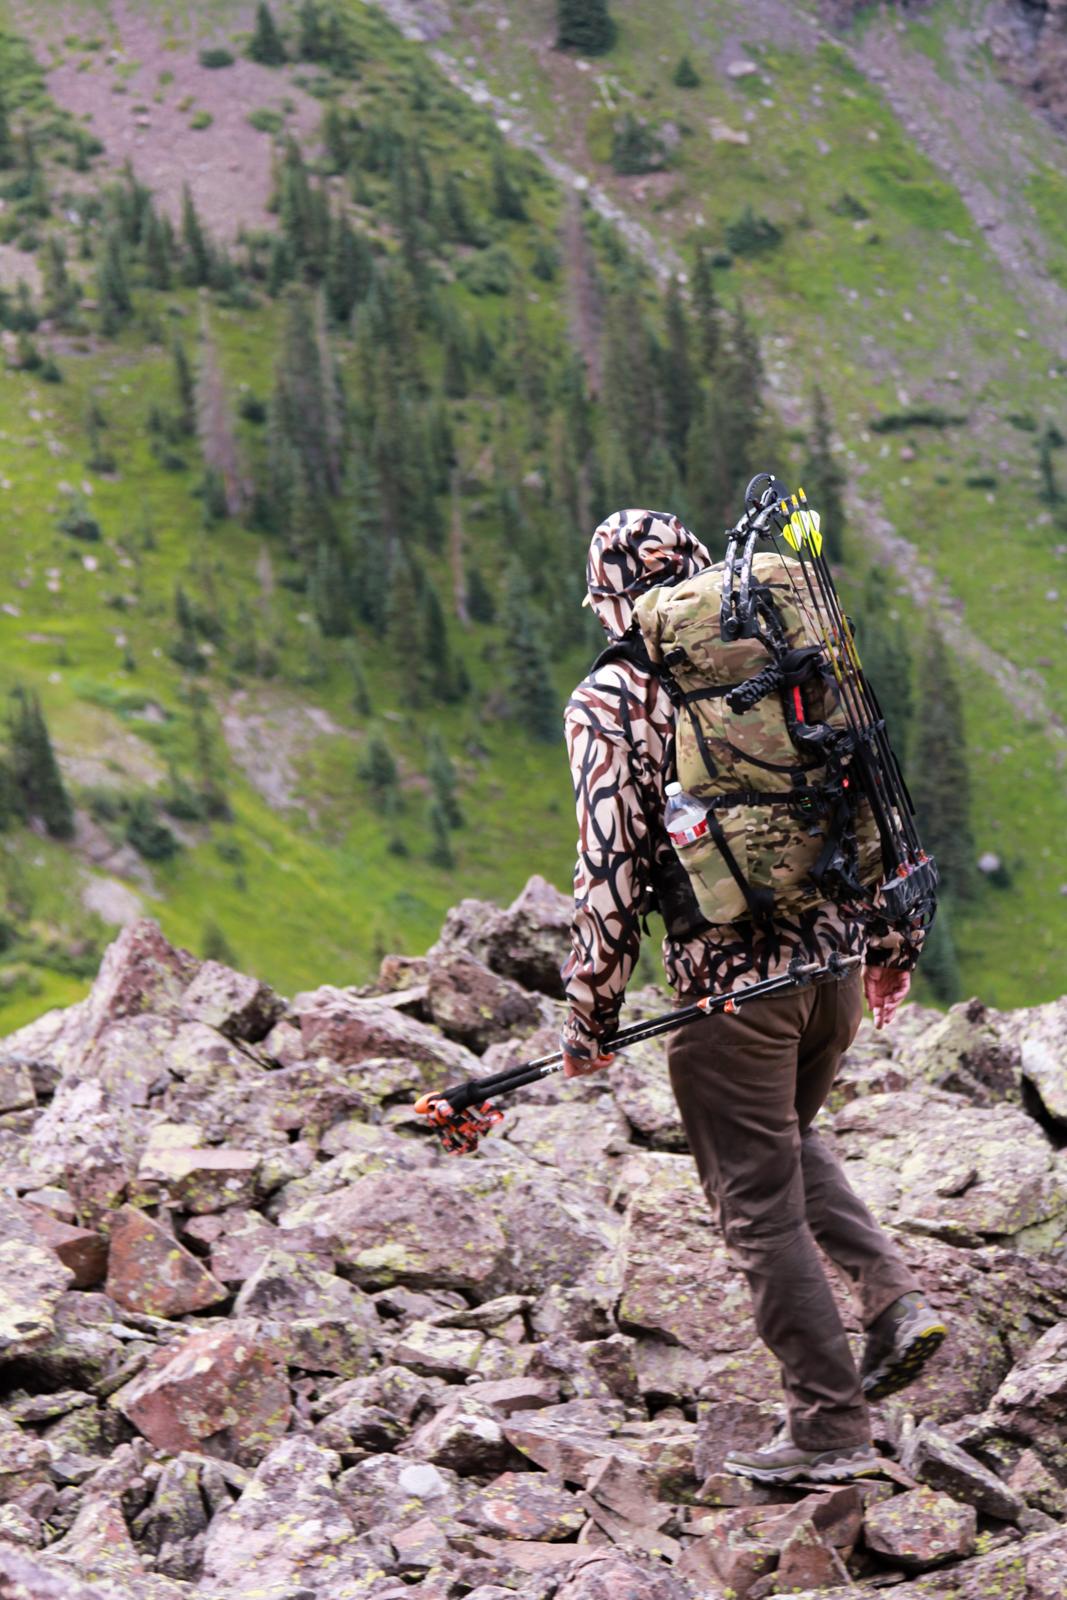 Lov na slikama i videu - Page 12 Seek-outside-unaweep-6300-multicam-backpacking-hunting2